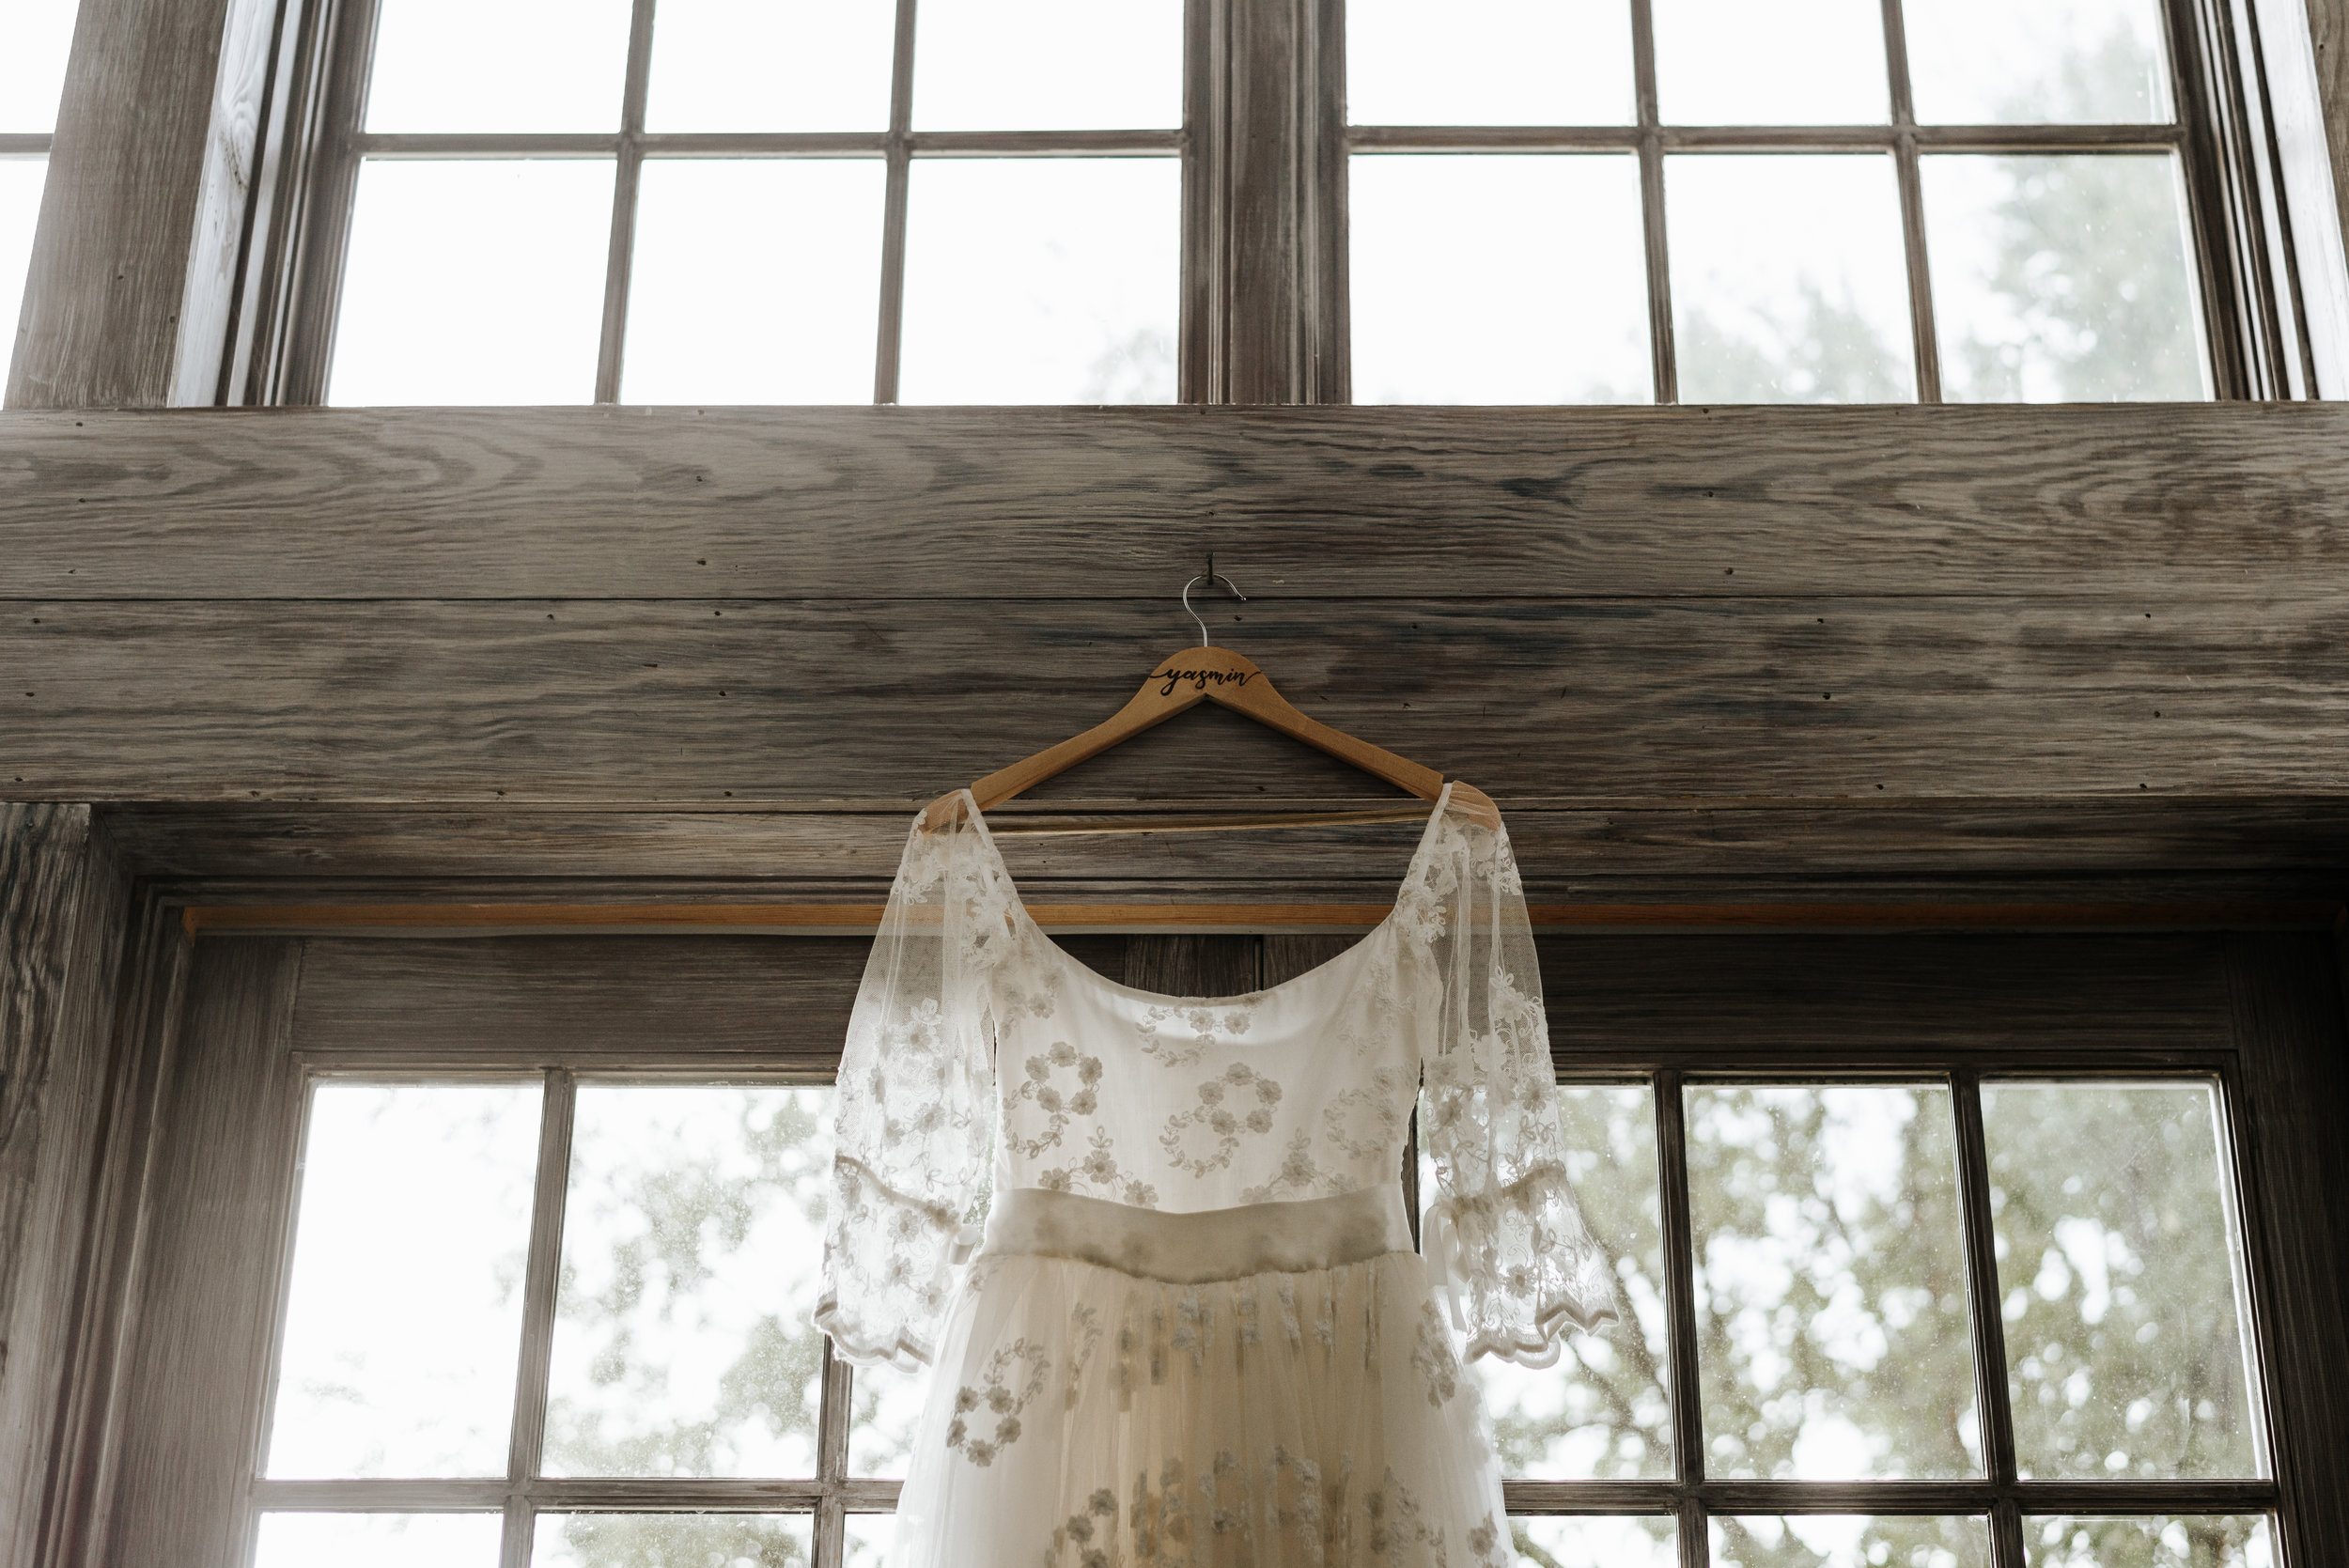 Veritas-Vineyards-and-Winery-Wedding-Photography-Afton-Virginia-Yasmin-Seth-Photography-by-V-8943.jpg